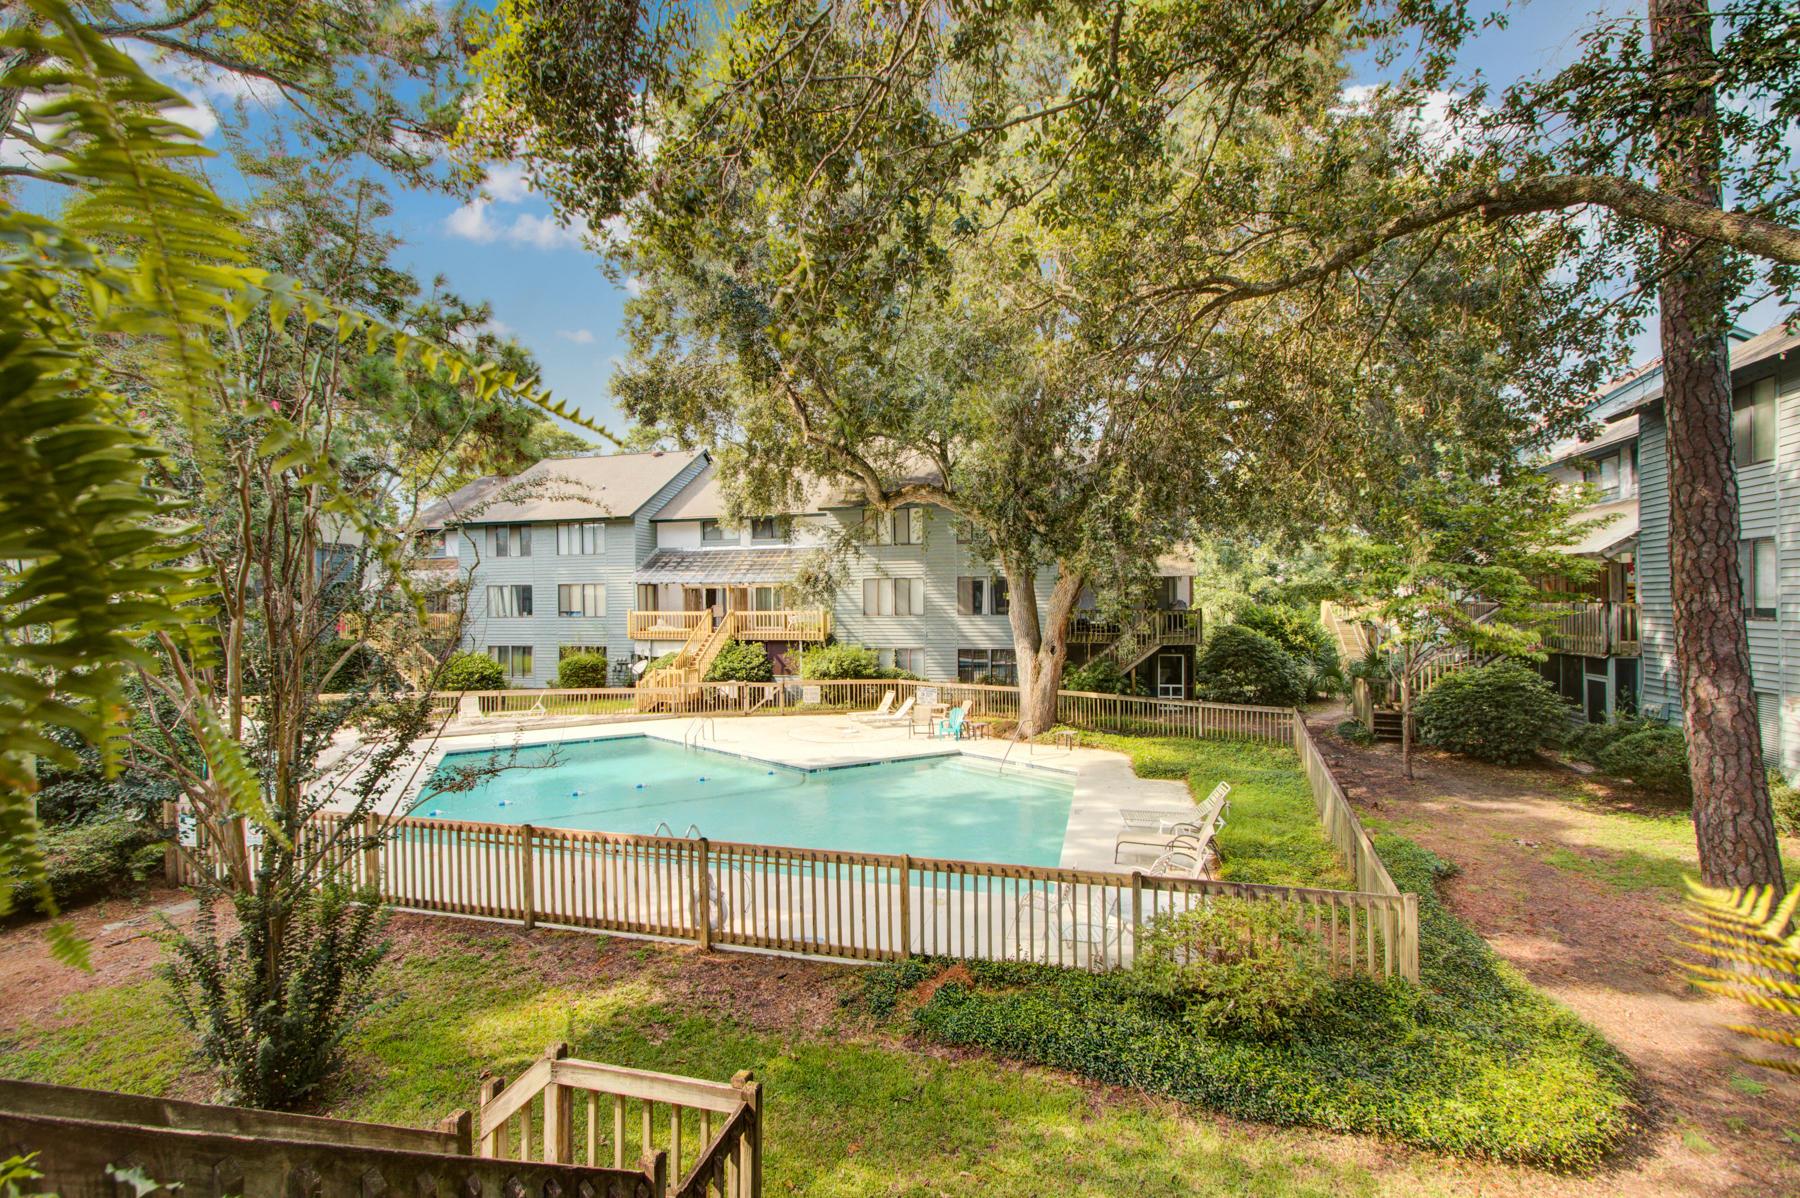 Snee Farm Lakes Homes For Sale - 1120 Hidden Cove, Mount Pleasant, SC - 18